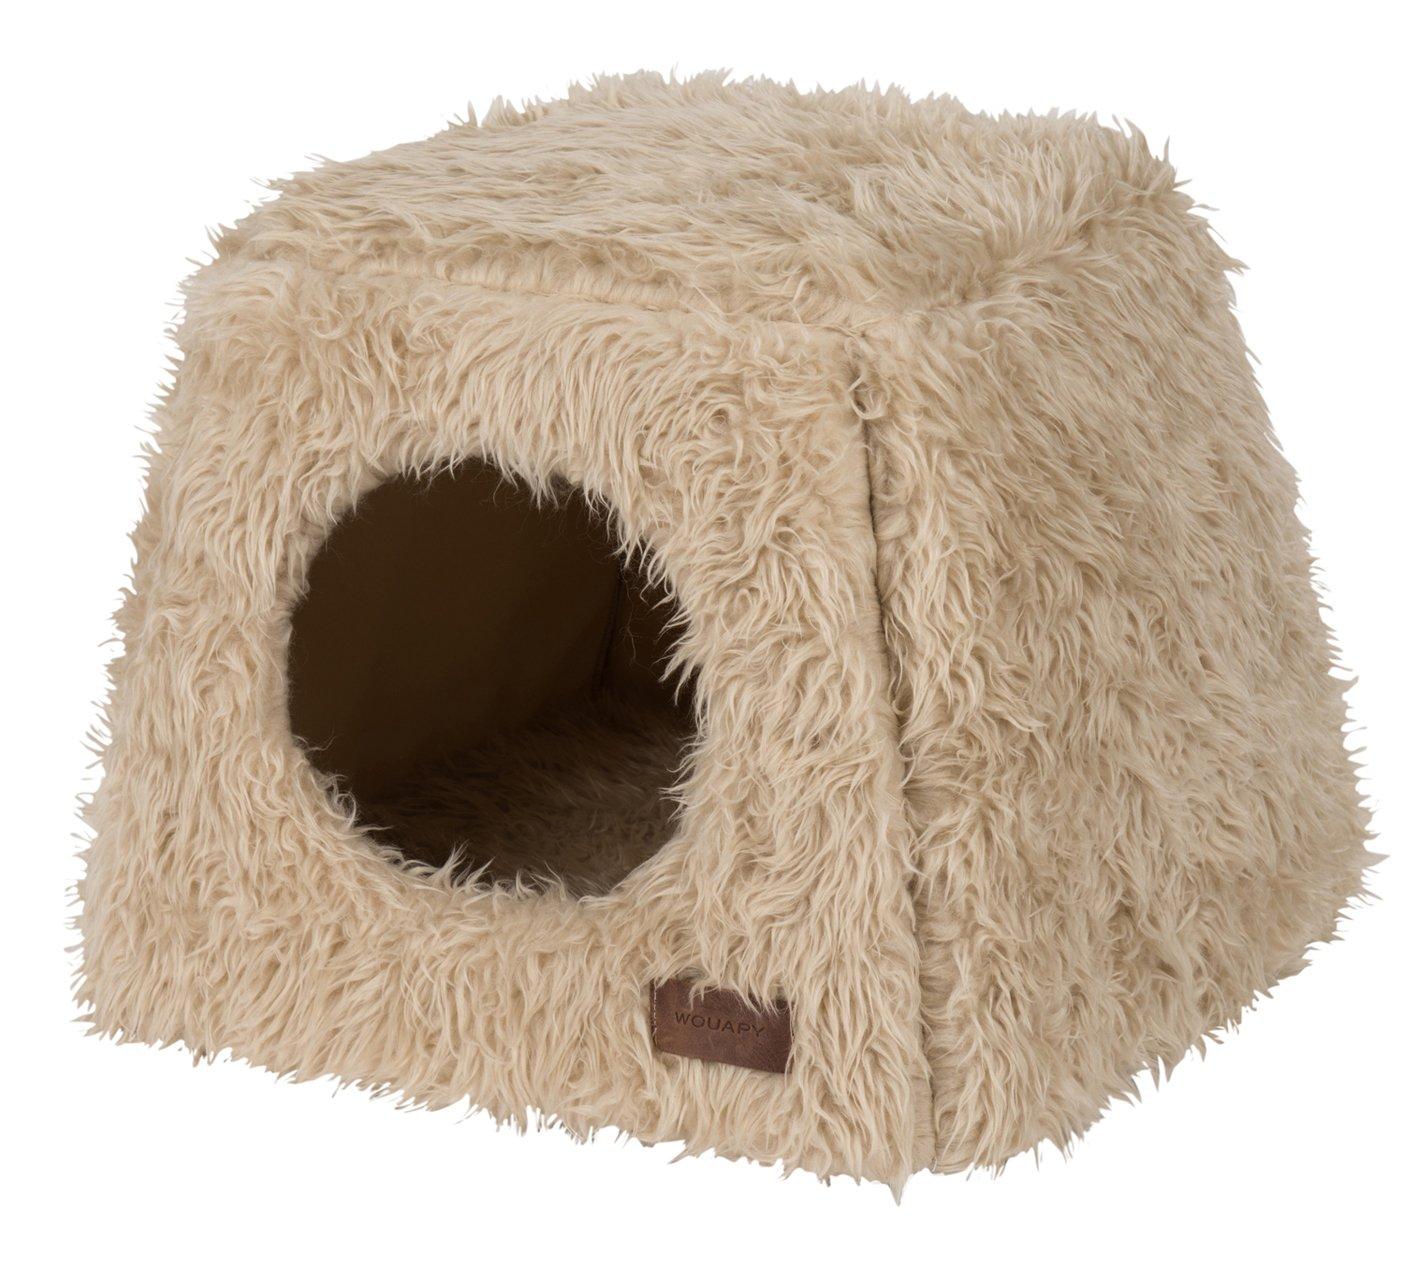 Wouapy Pyramid Deluxe - Caseta de Gato para Gatos, Color Beige: Amazon.es: Productos para mascotas